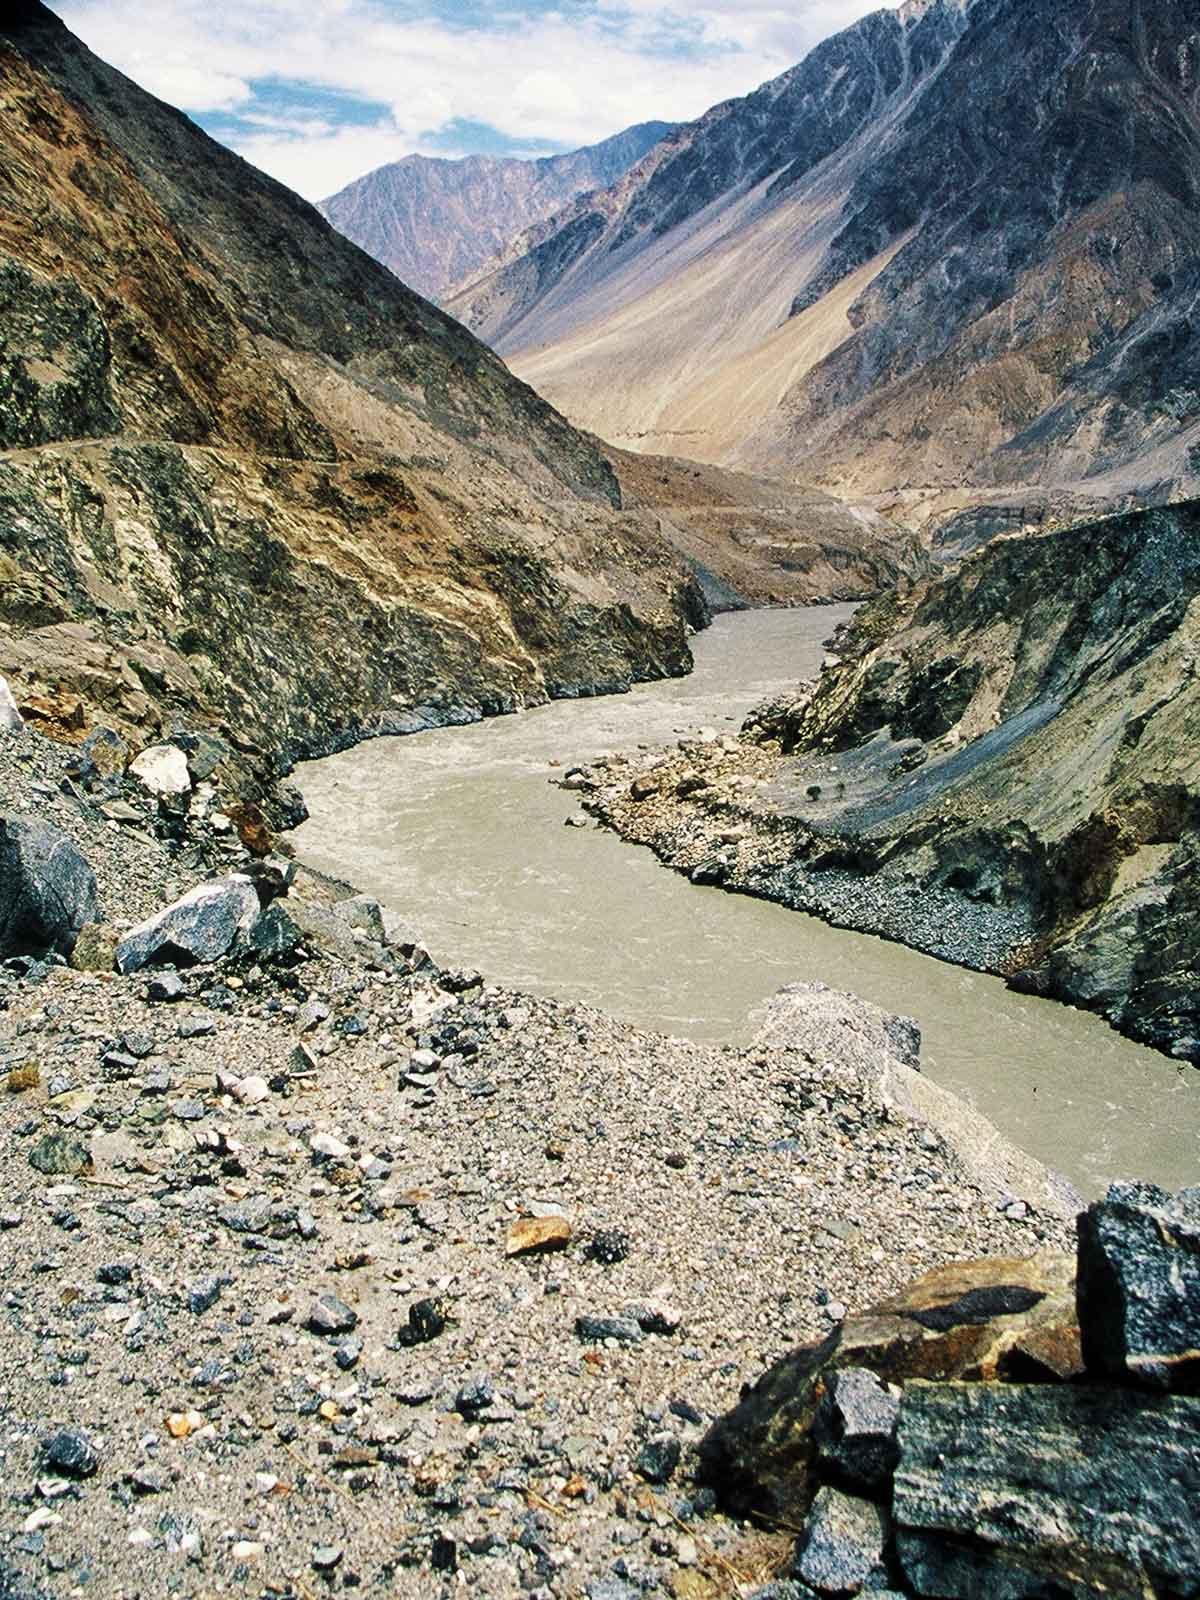 Indus River Valley - Gilgit-Baltistan region - Pakistan Photo Journal - Karakoram Highway - Steven Martin - Silk Road